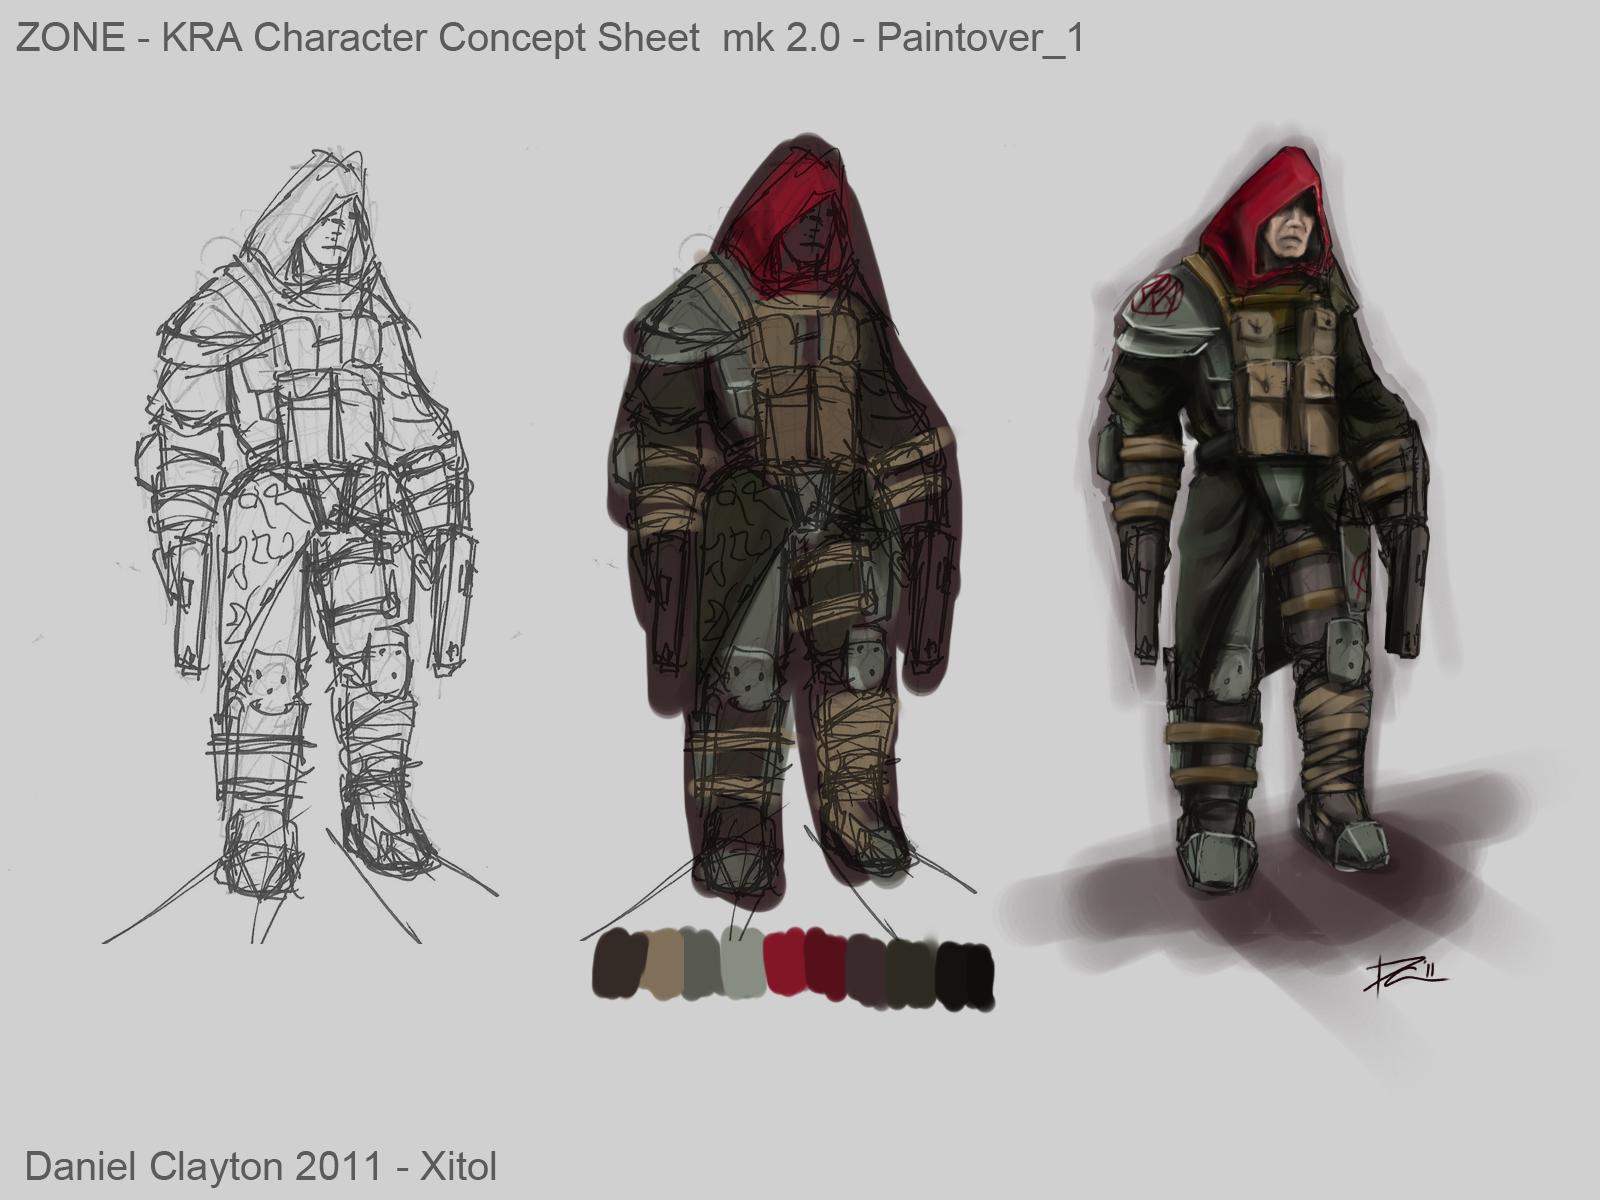 KRA_Concept_mk2_wip4_DC